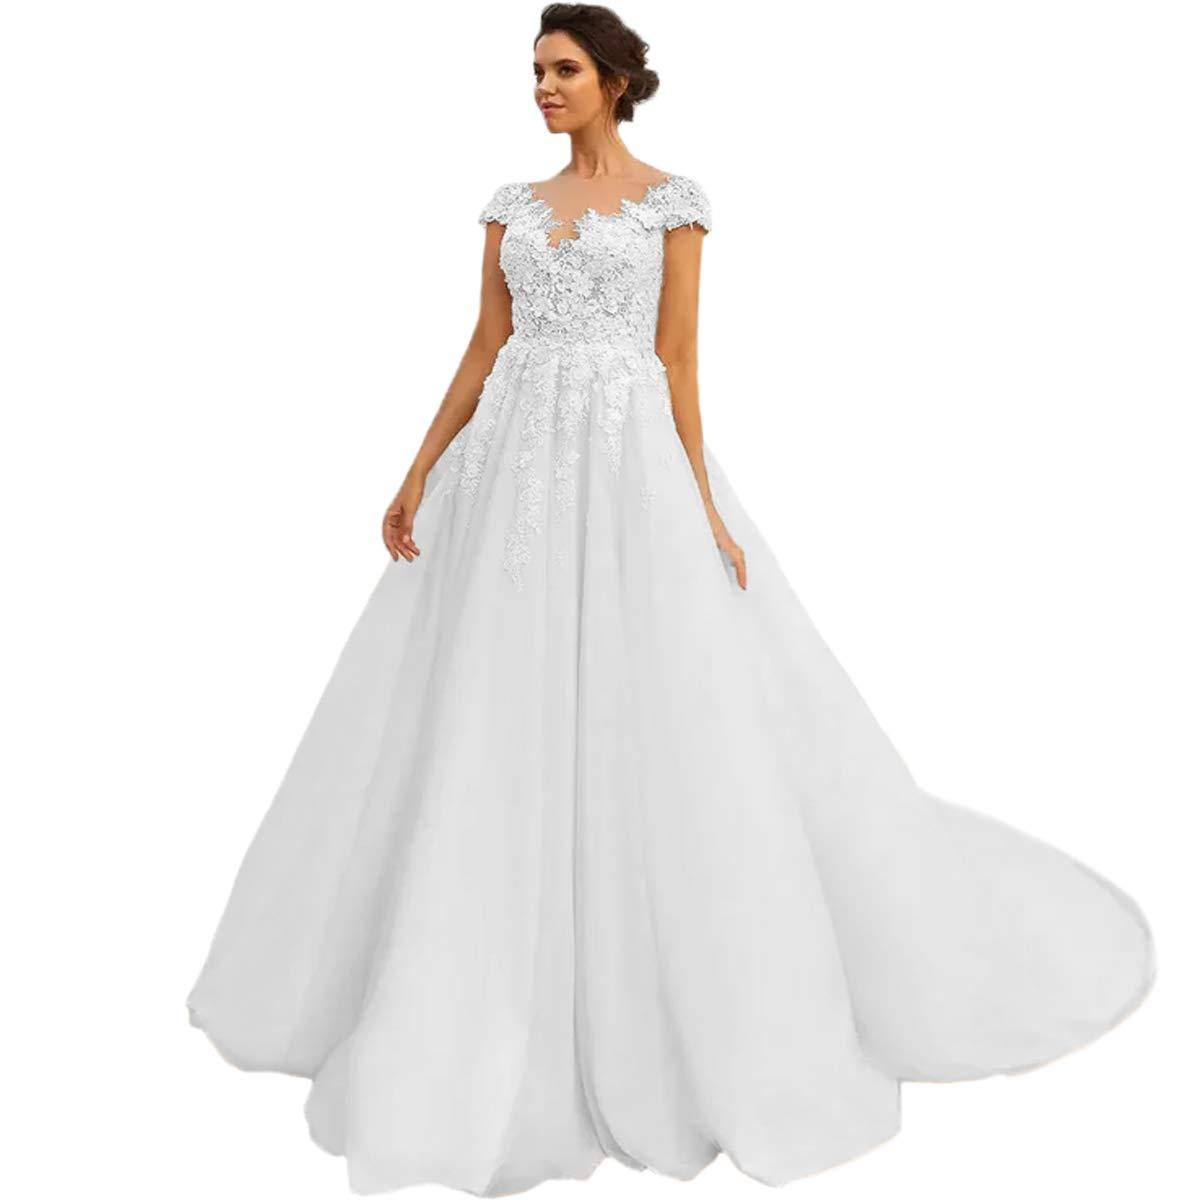 Buying Preloved Wedding Dresses in Brisbane